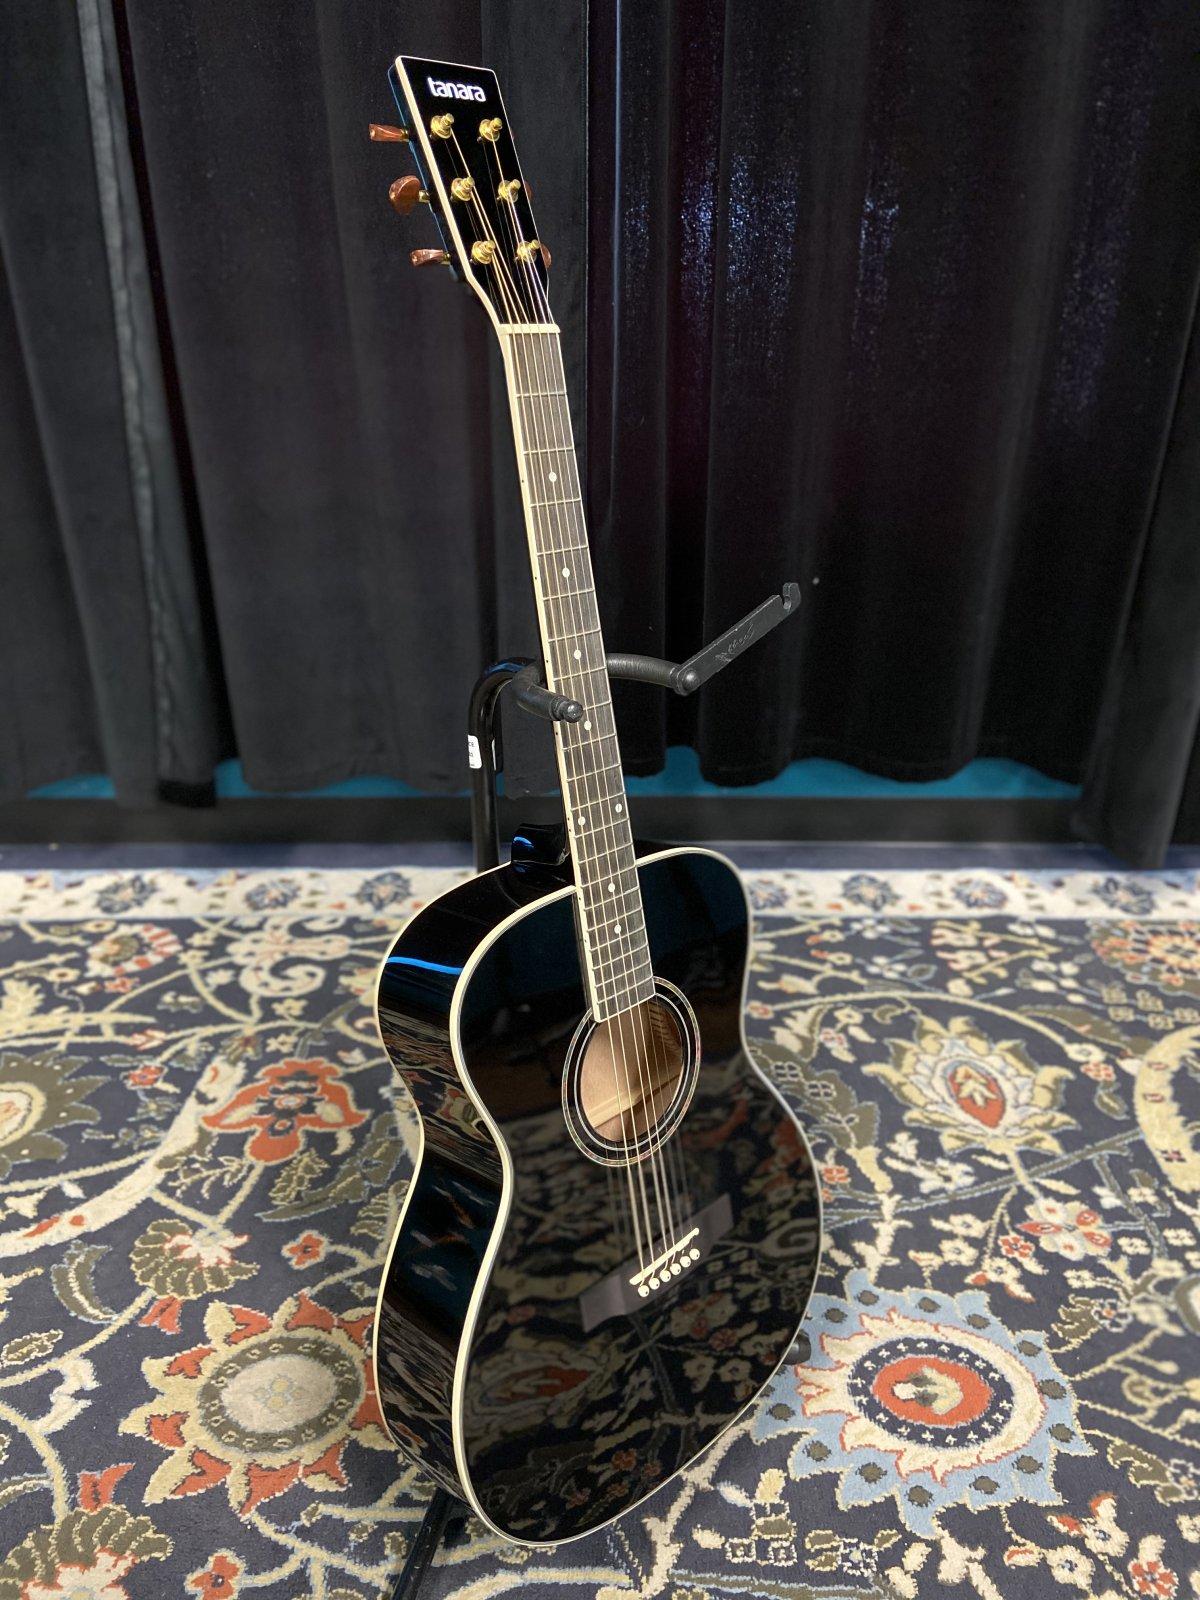 Tanara 1/2-Scale Acoustic Guitar - Black